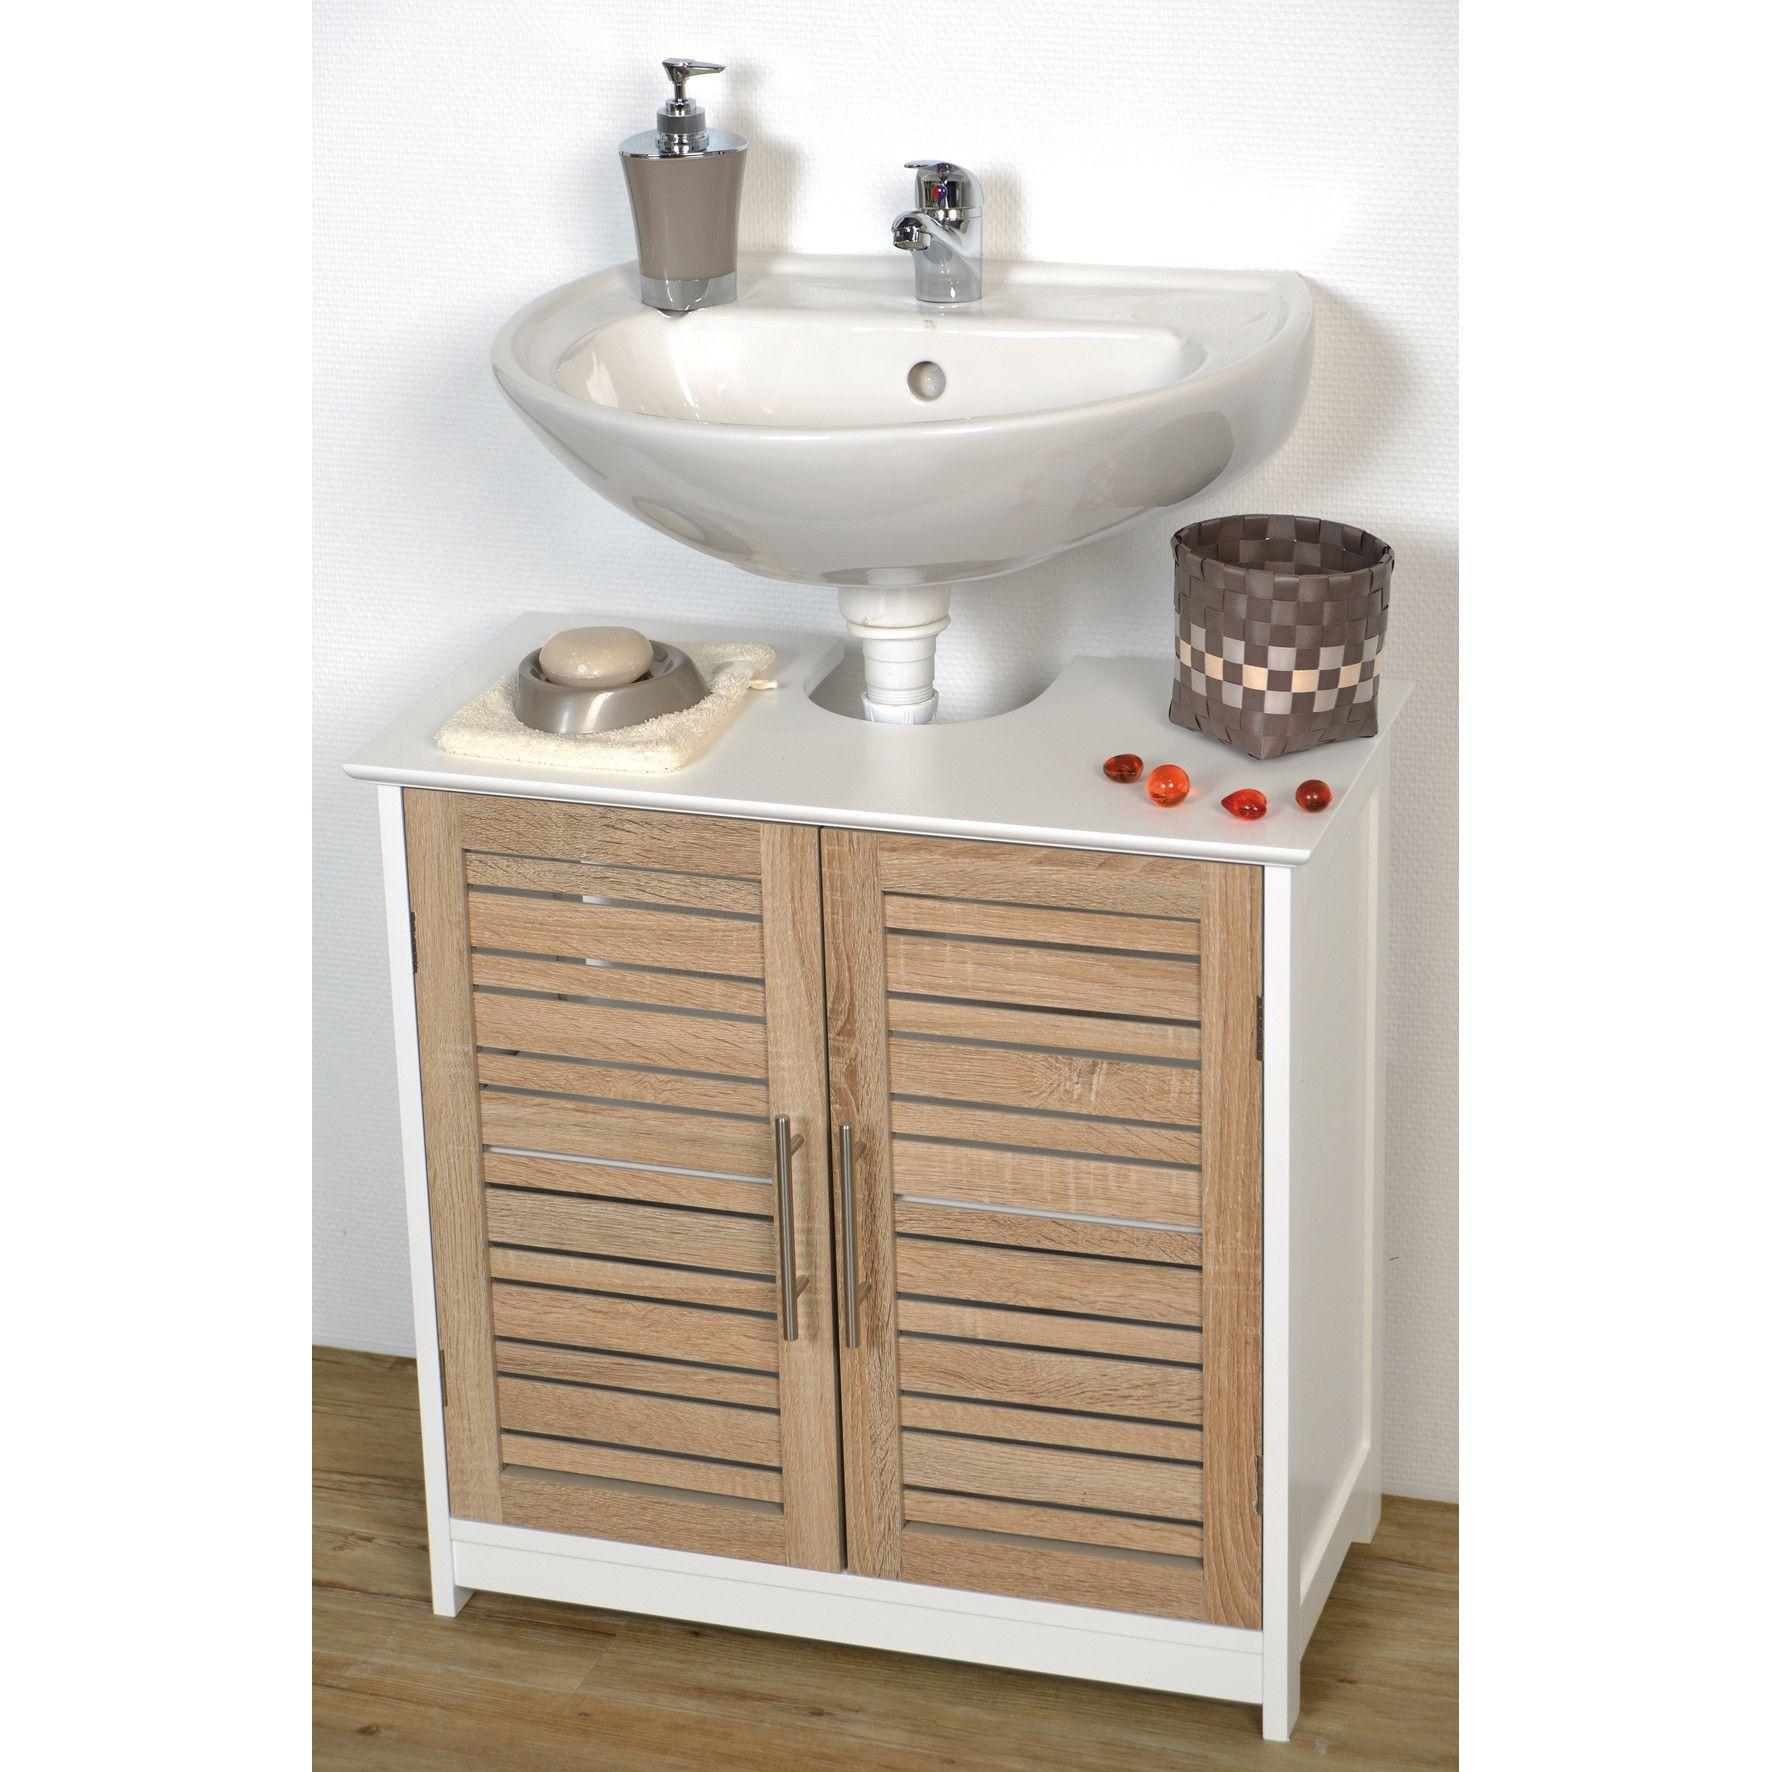 "Evideco Stockholm 23 6"" Bath Under Sink Storage Vanity something"